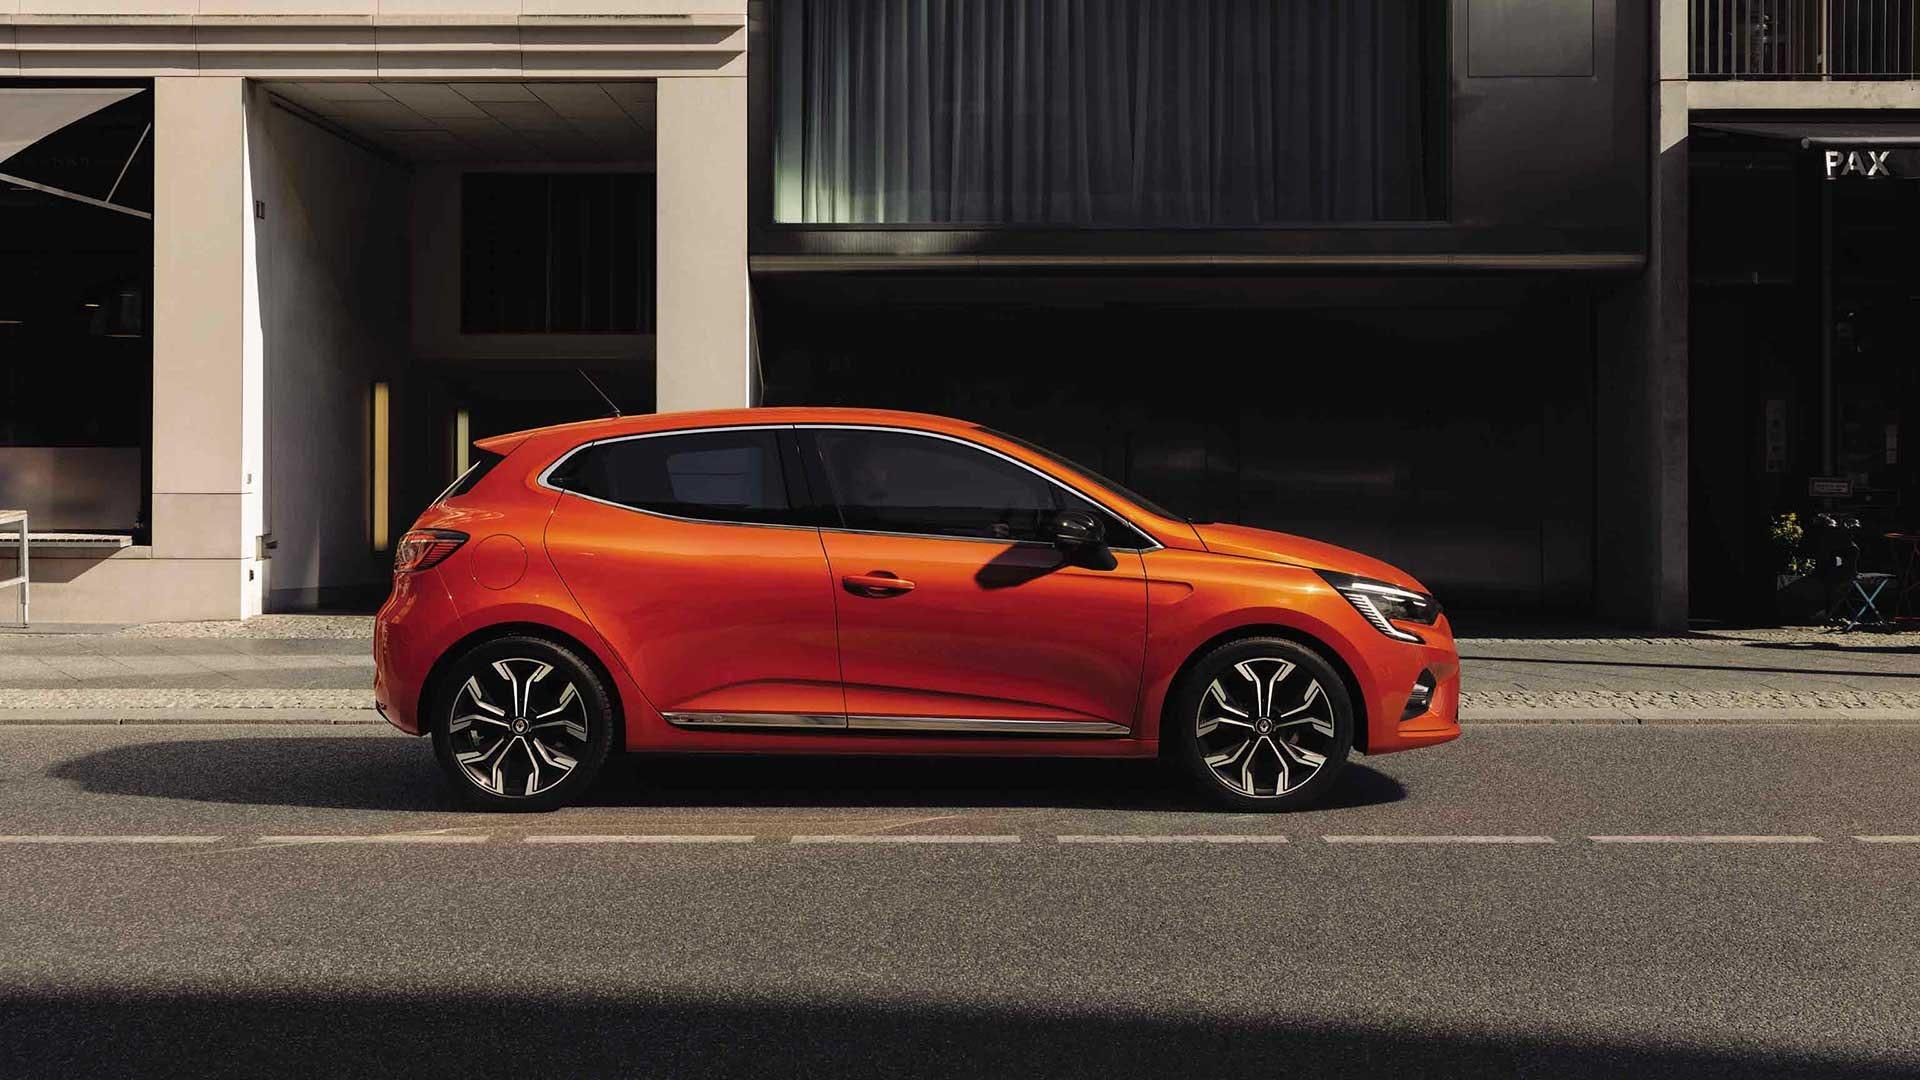 Ny Renault Clio 2019